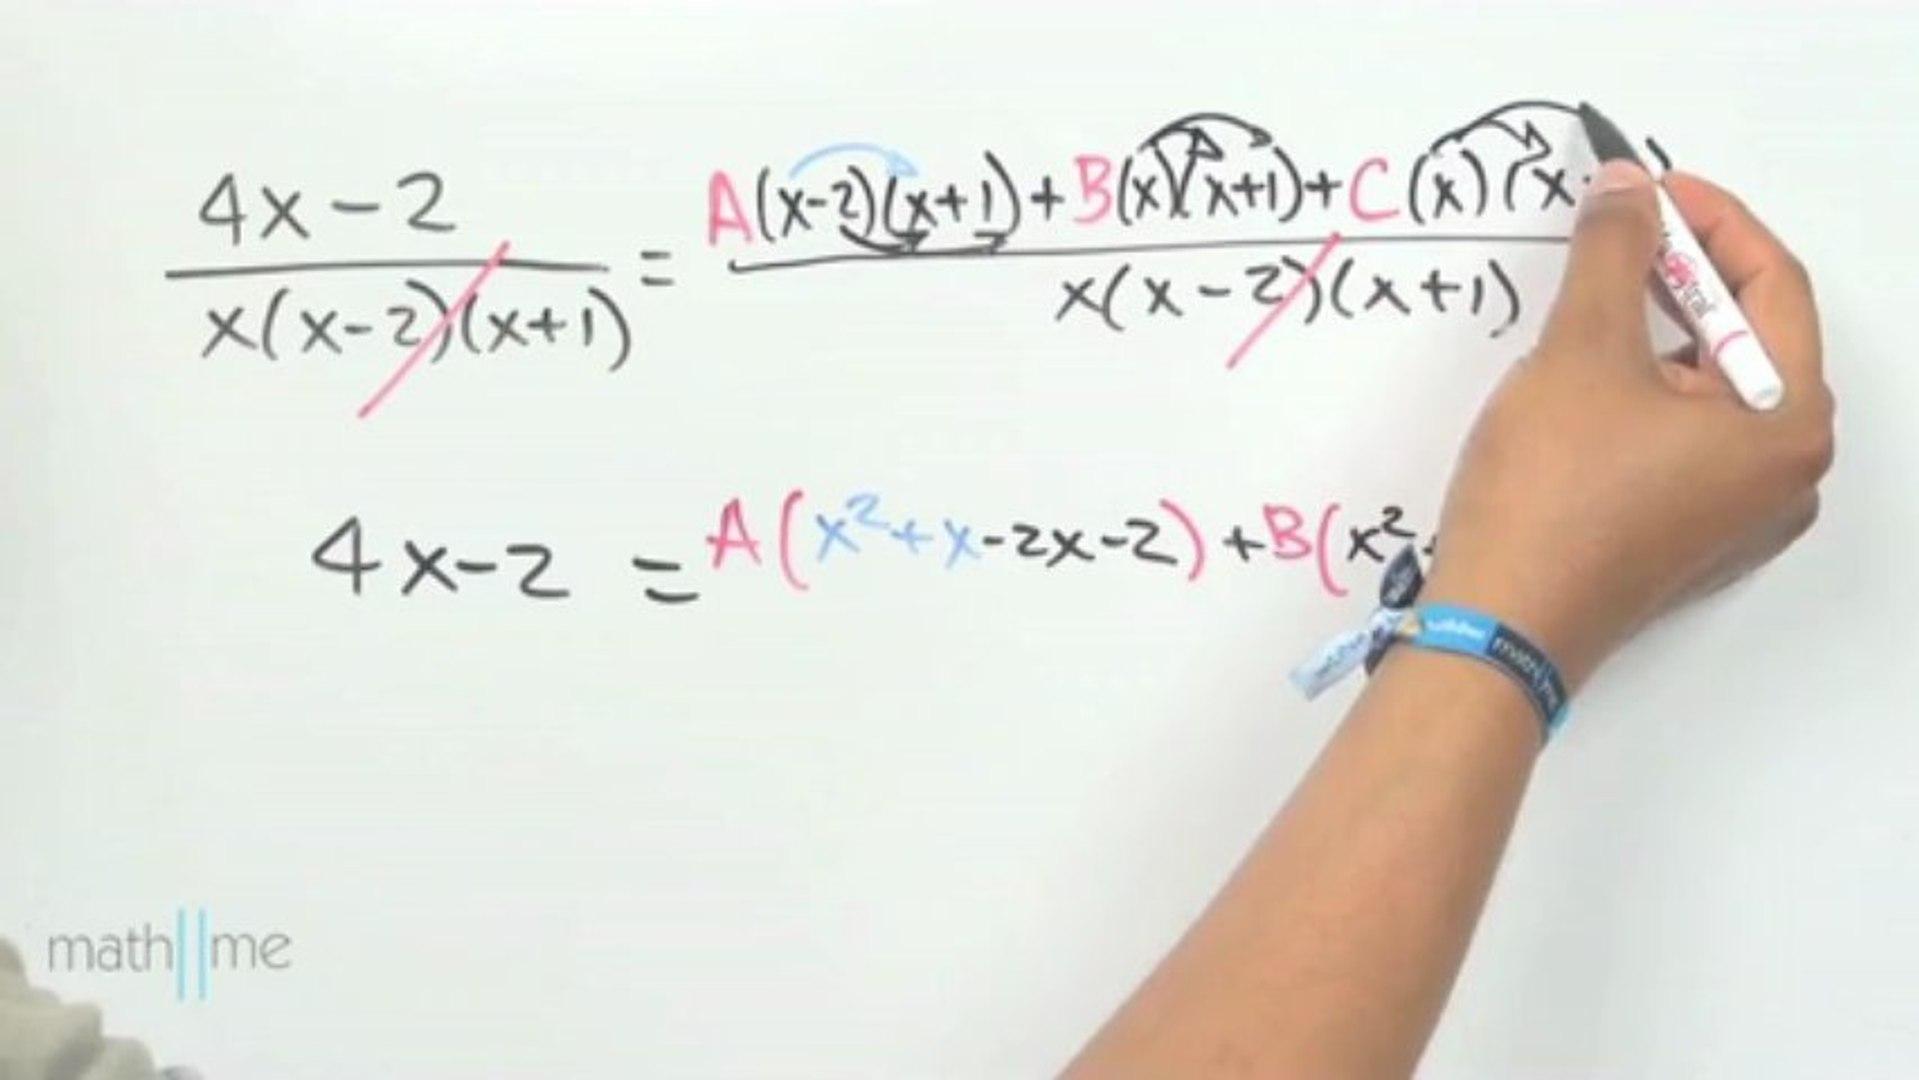 integrar 4x 2 x 3 x 2 2x por facciones parciales p1 video dailymotion integrar 4x 2 x 3 x 2 2x por facciones parciales p1